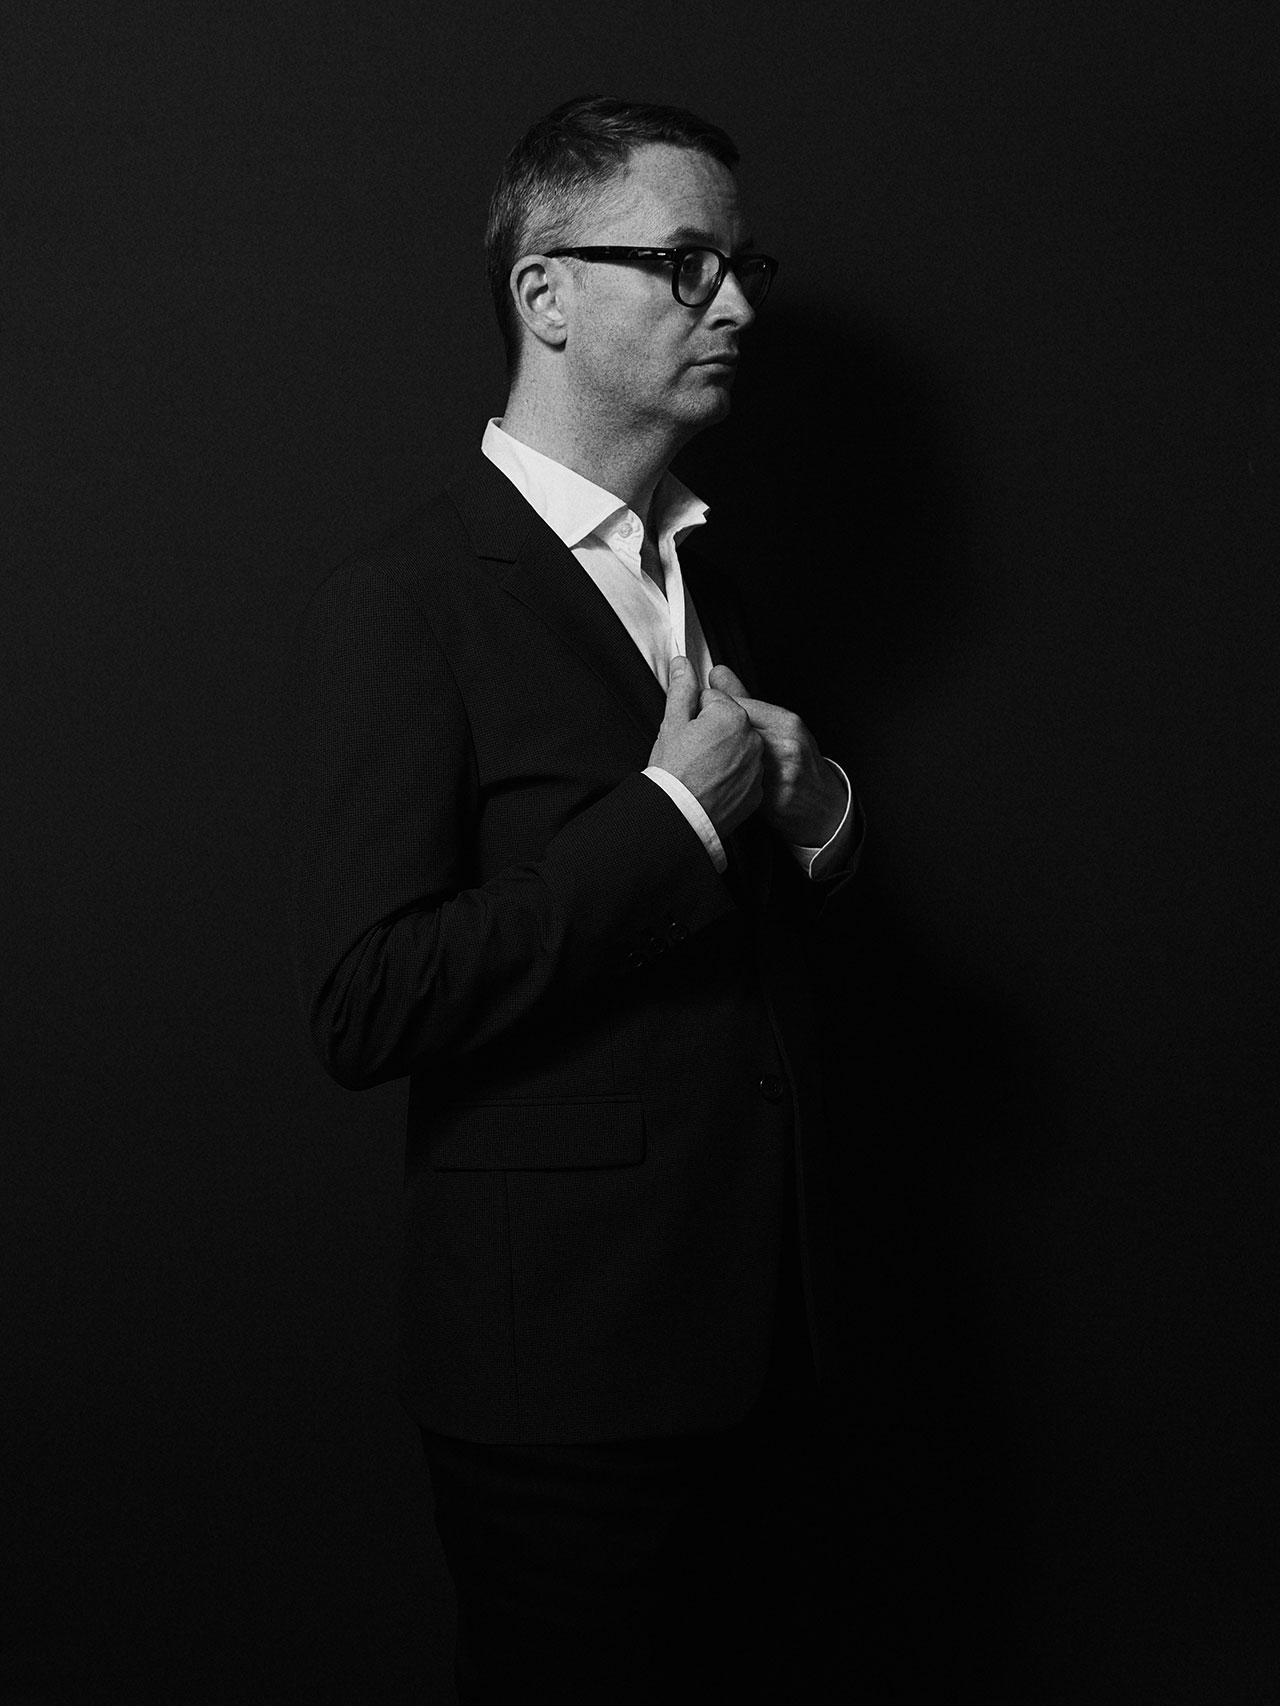 Nicolas Winding Refn | Photography: Hiroki Watanabe | © The Fashion Post